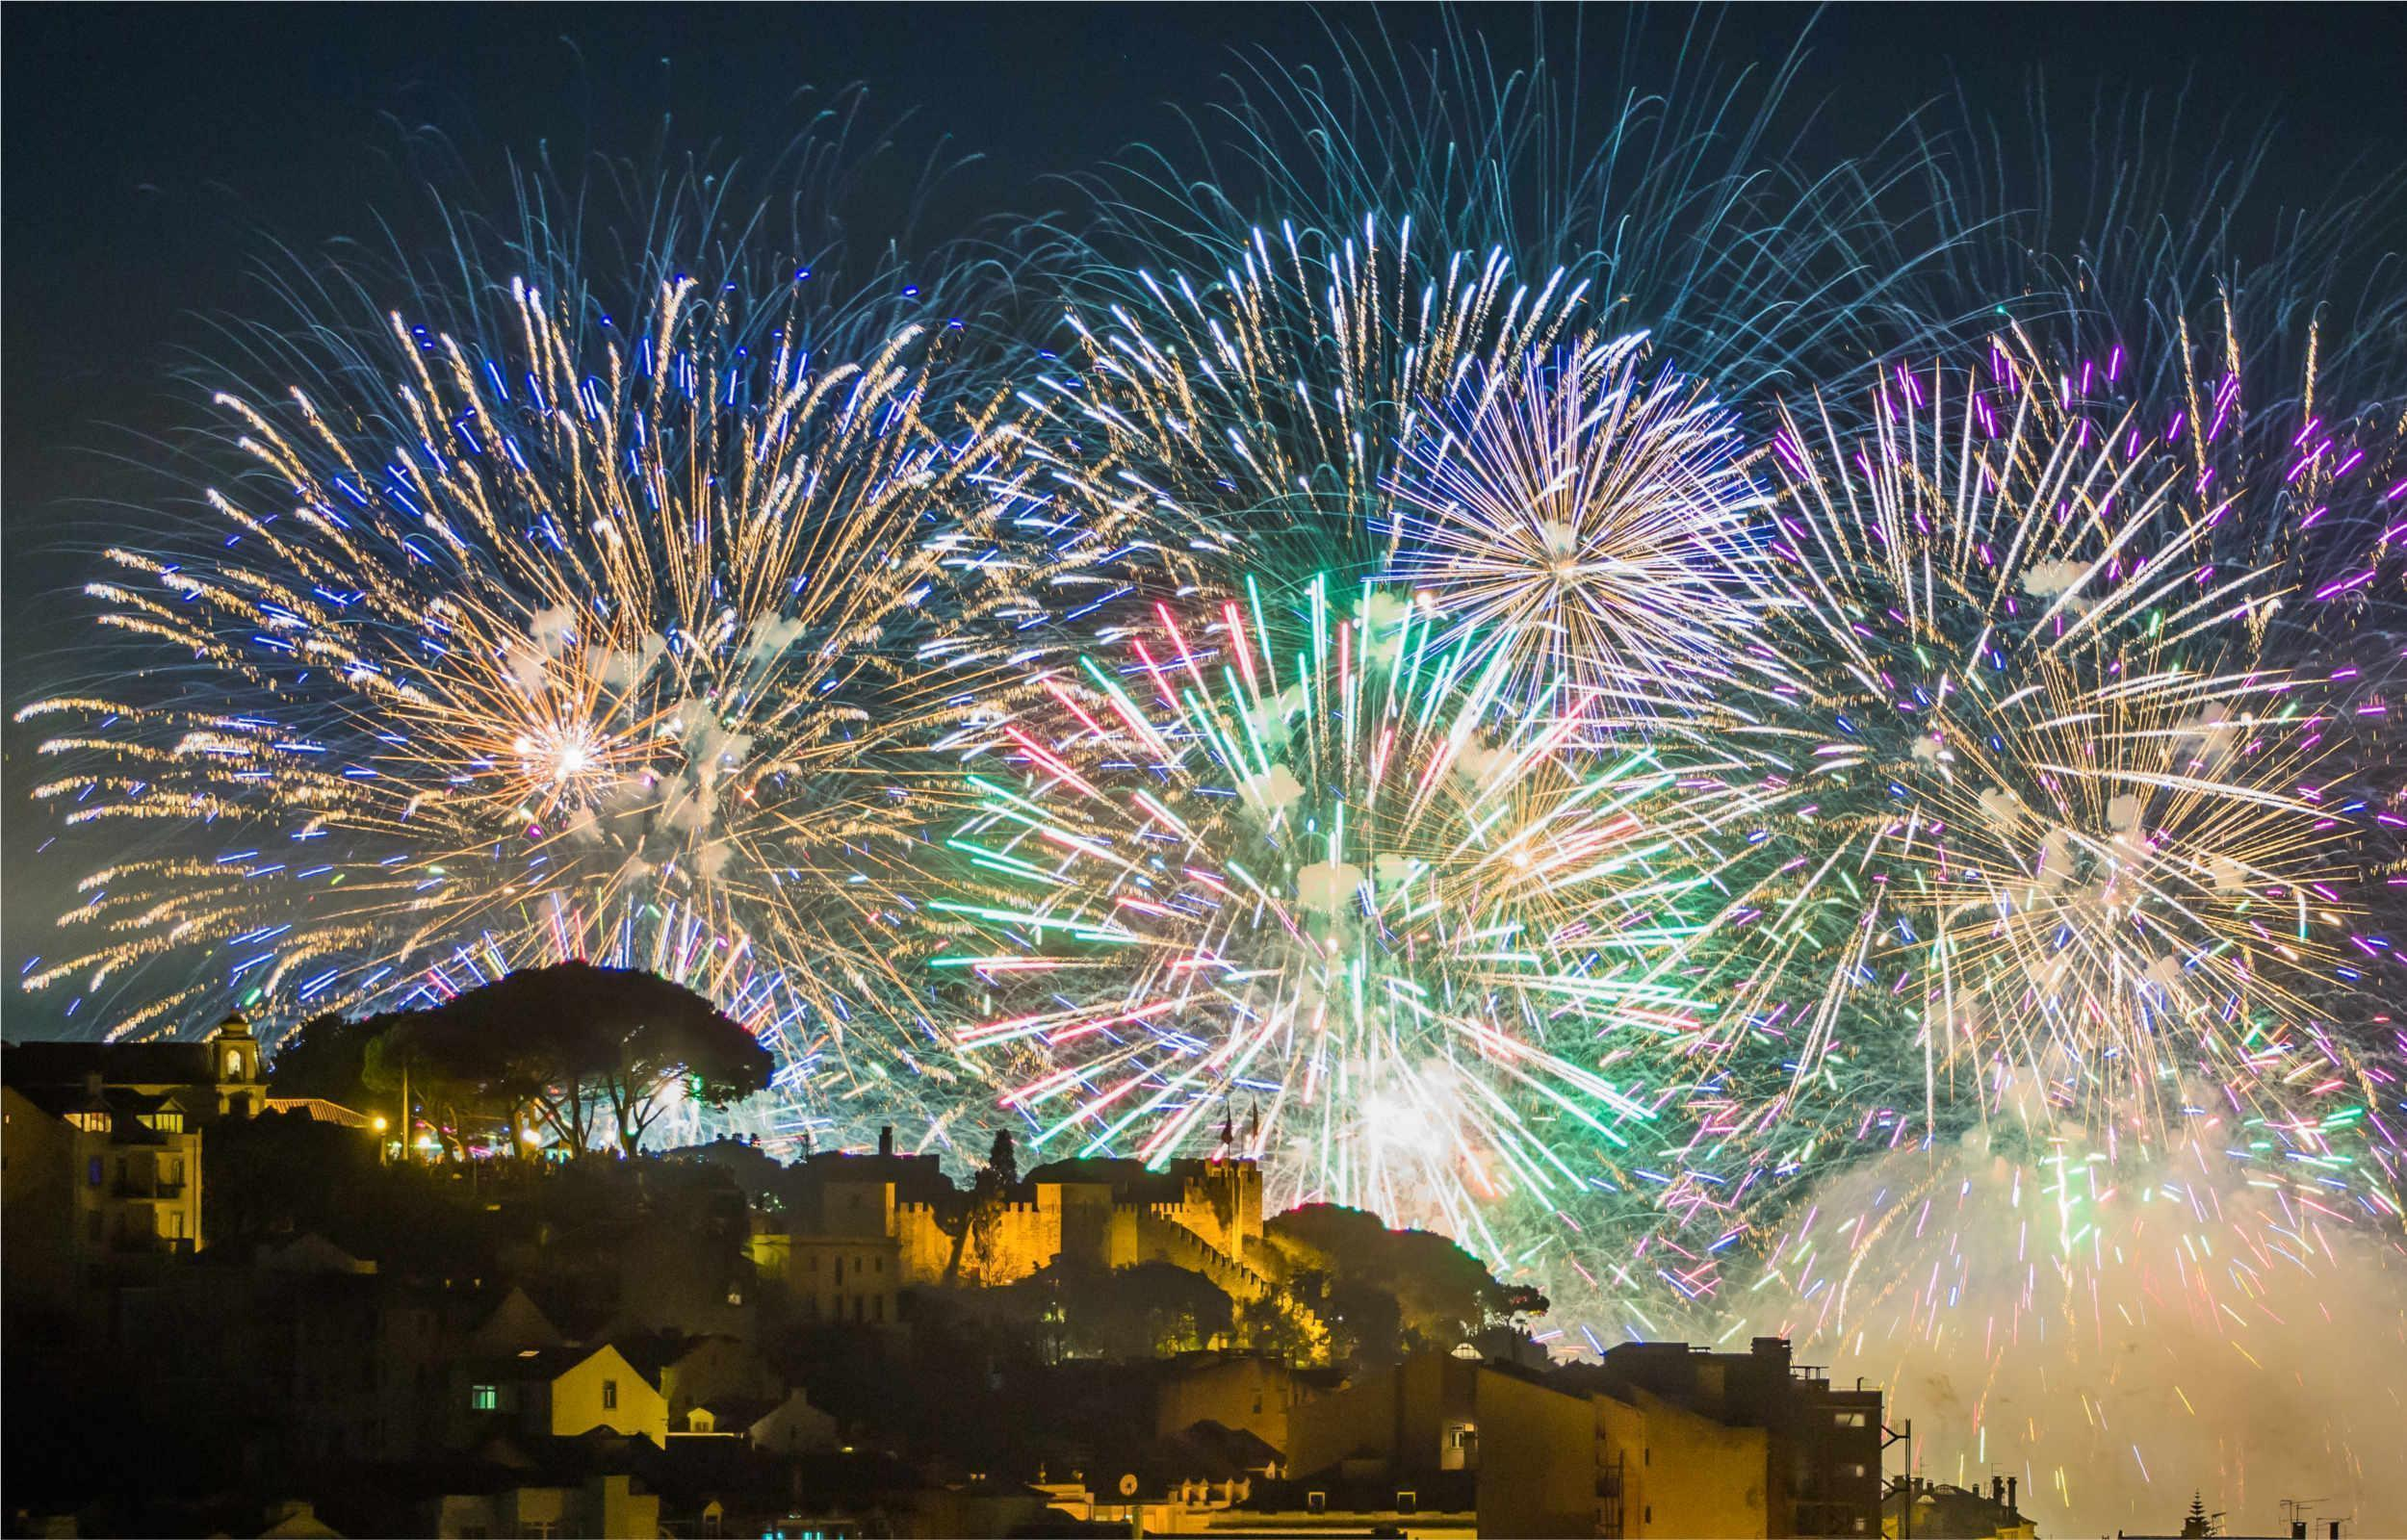 Lisbona d'Incanto - Speciale Capodanno